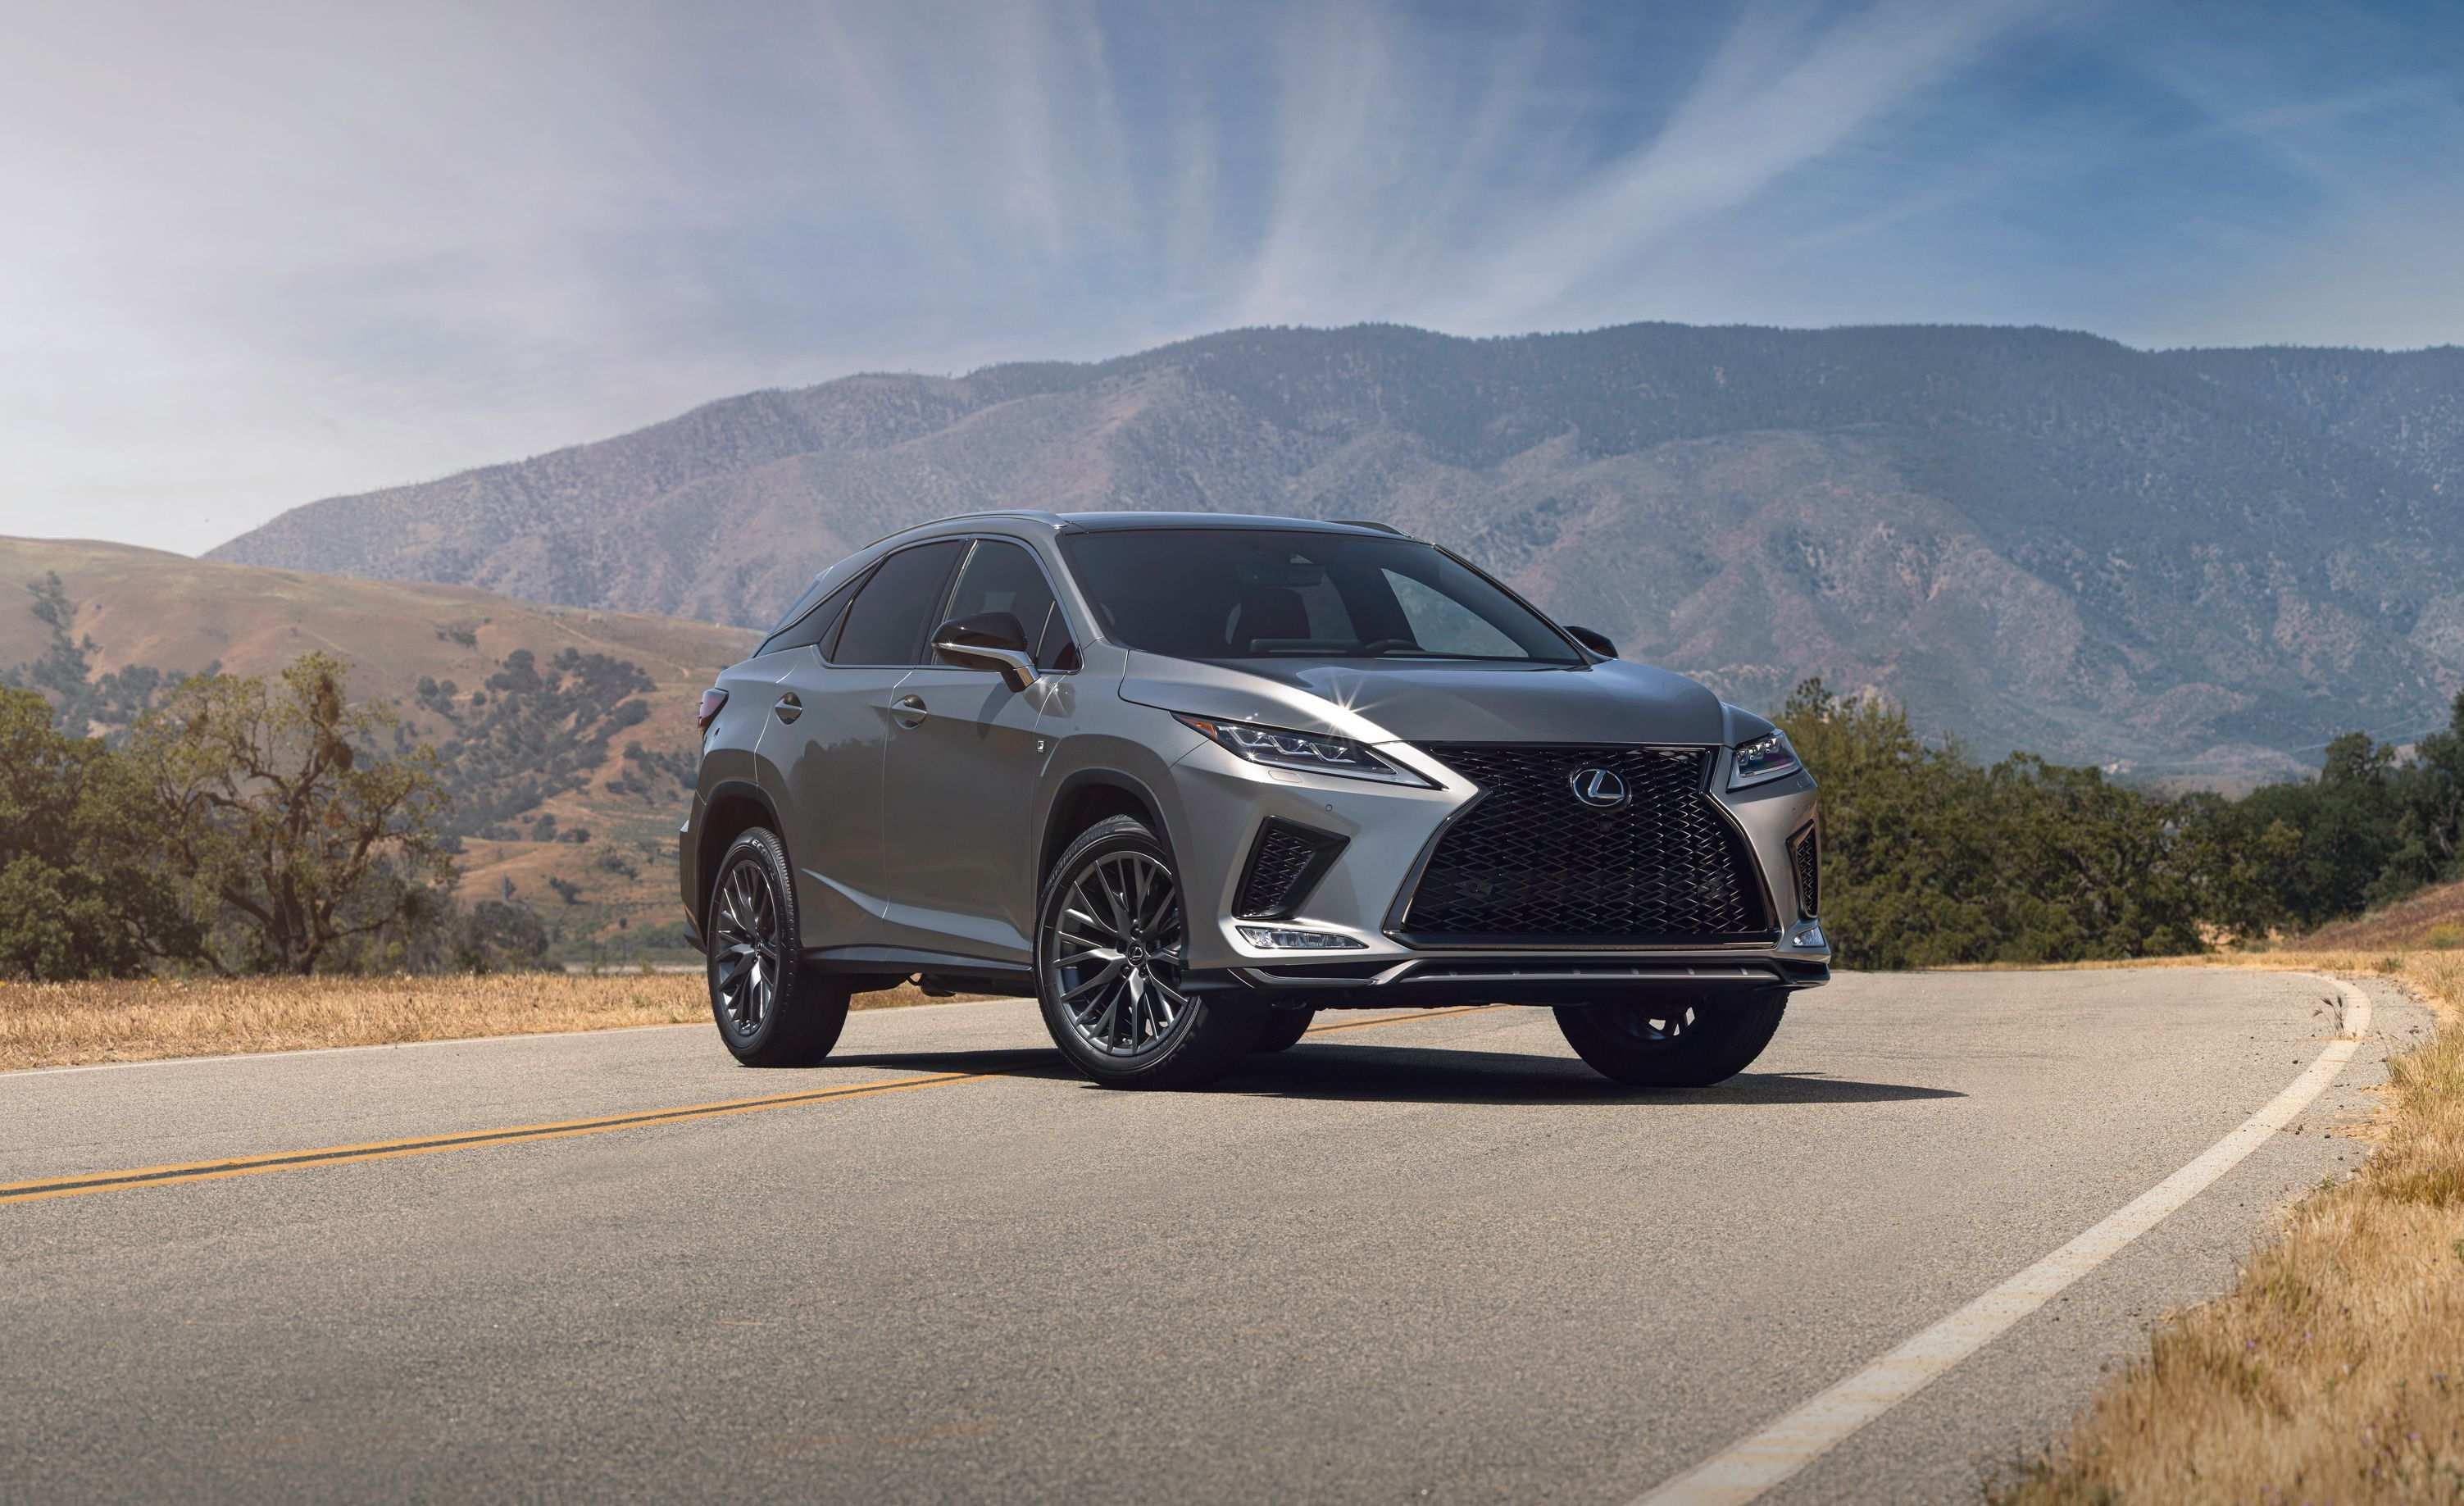 14 Best Review 2020 Lexus Es Hybrid Release Date with 2020 Lexus Es Hybrid